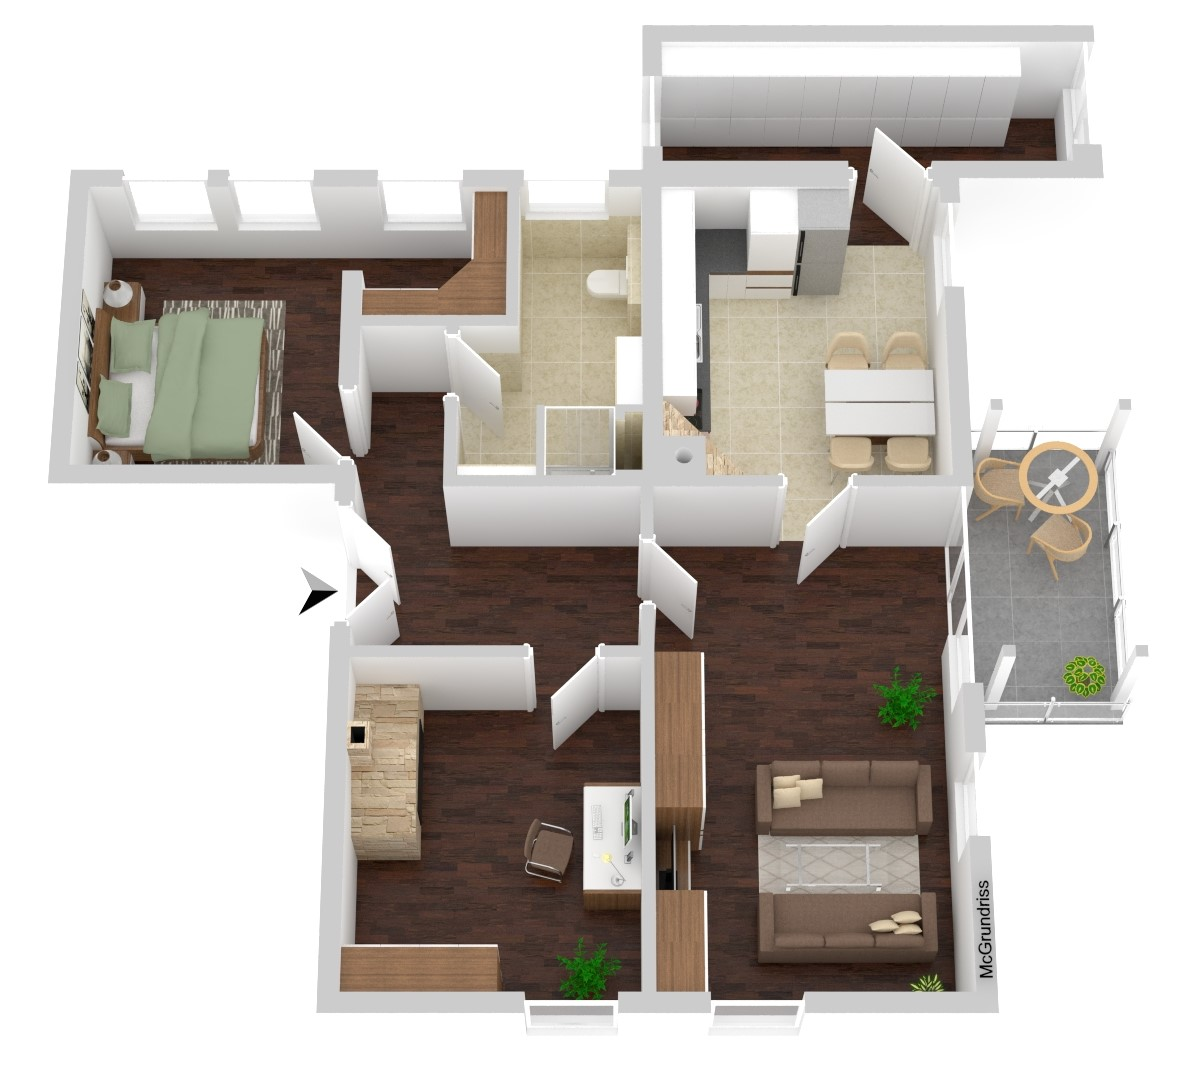 Wohnung Nr. 3 (96,71 m²)